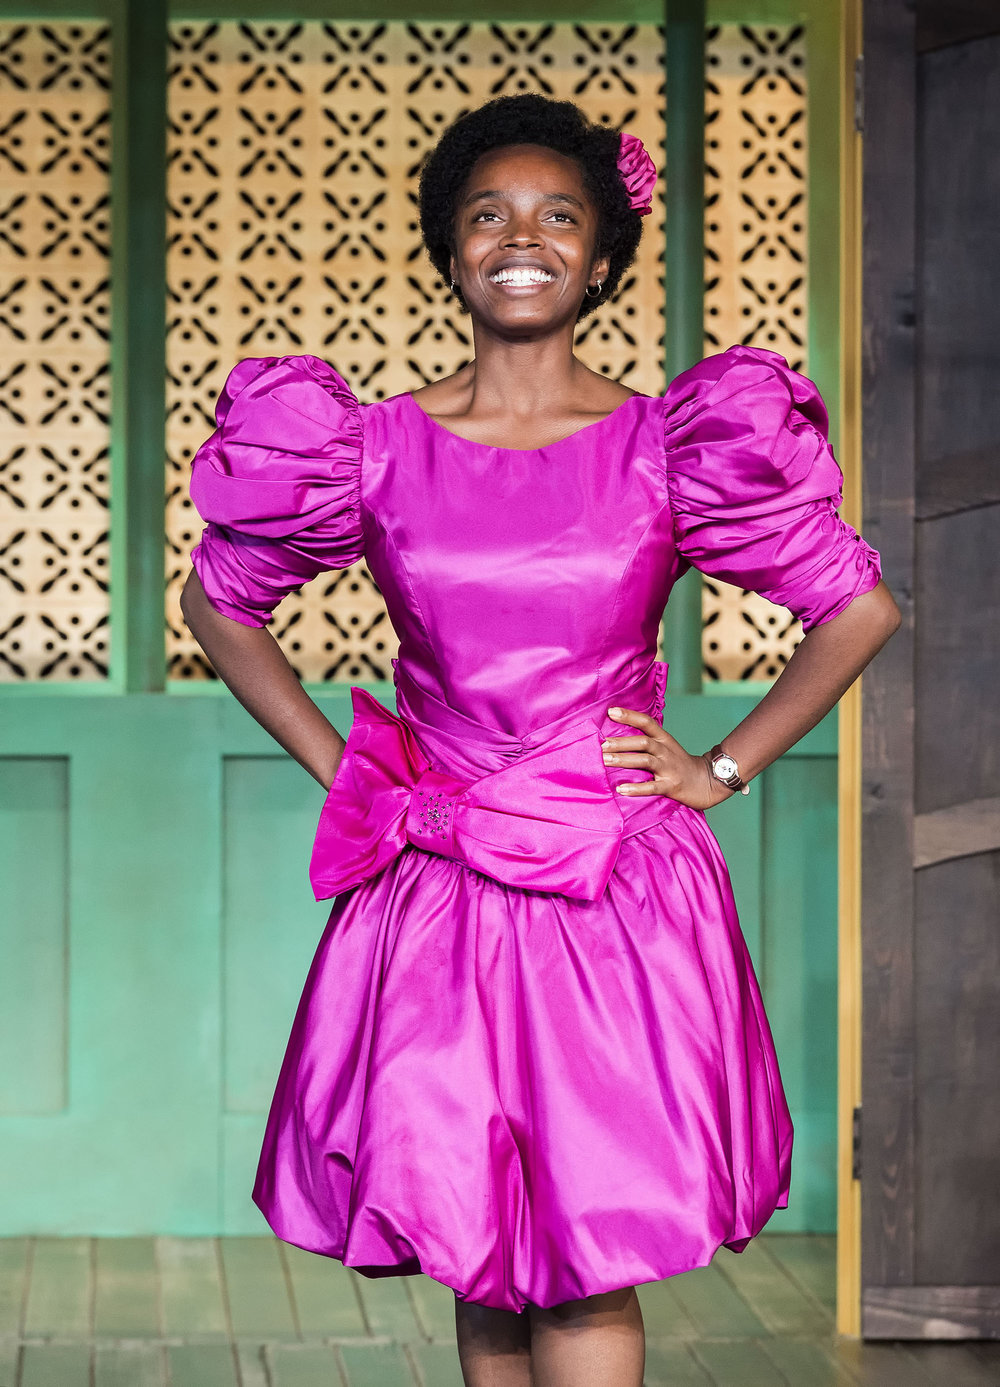 WEB-196.MaameYaa-Boafo-in-School-Girls-Or-the-African-Mean-Girls-Play-photo-by-Craig-Schwartz.jpg